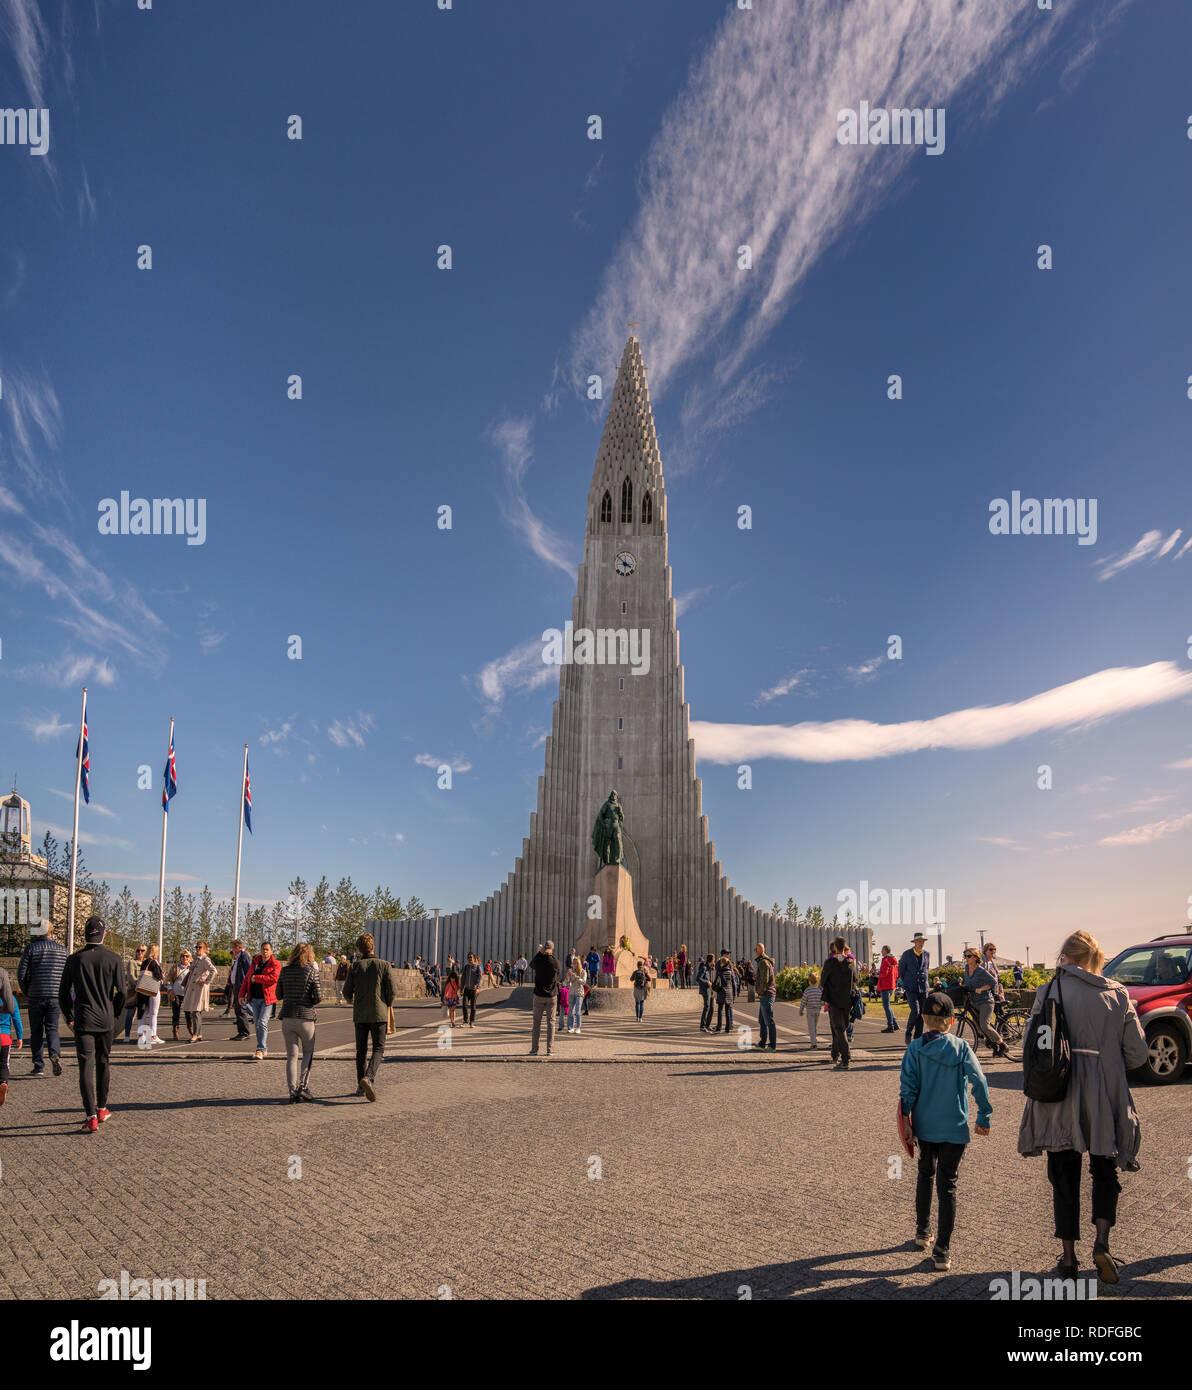 Touristen und Kirche Hallgrimskirkja, Reykjavik, Island Stockbild